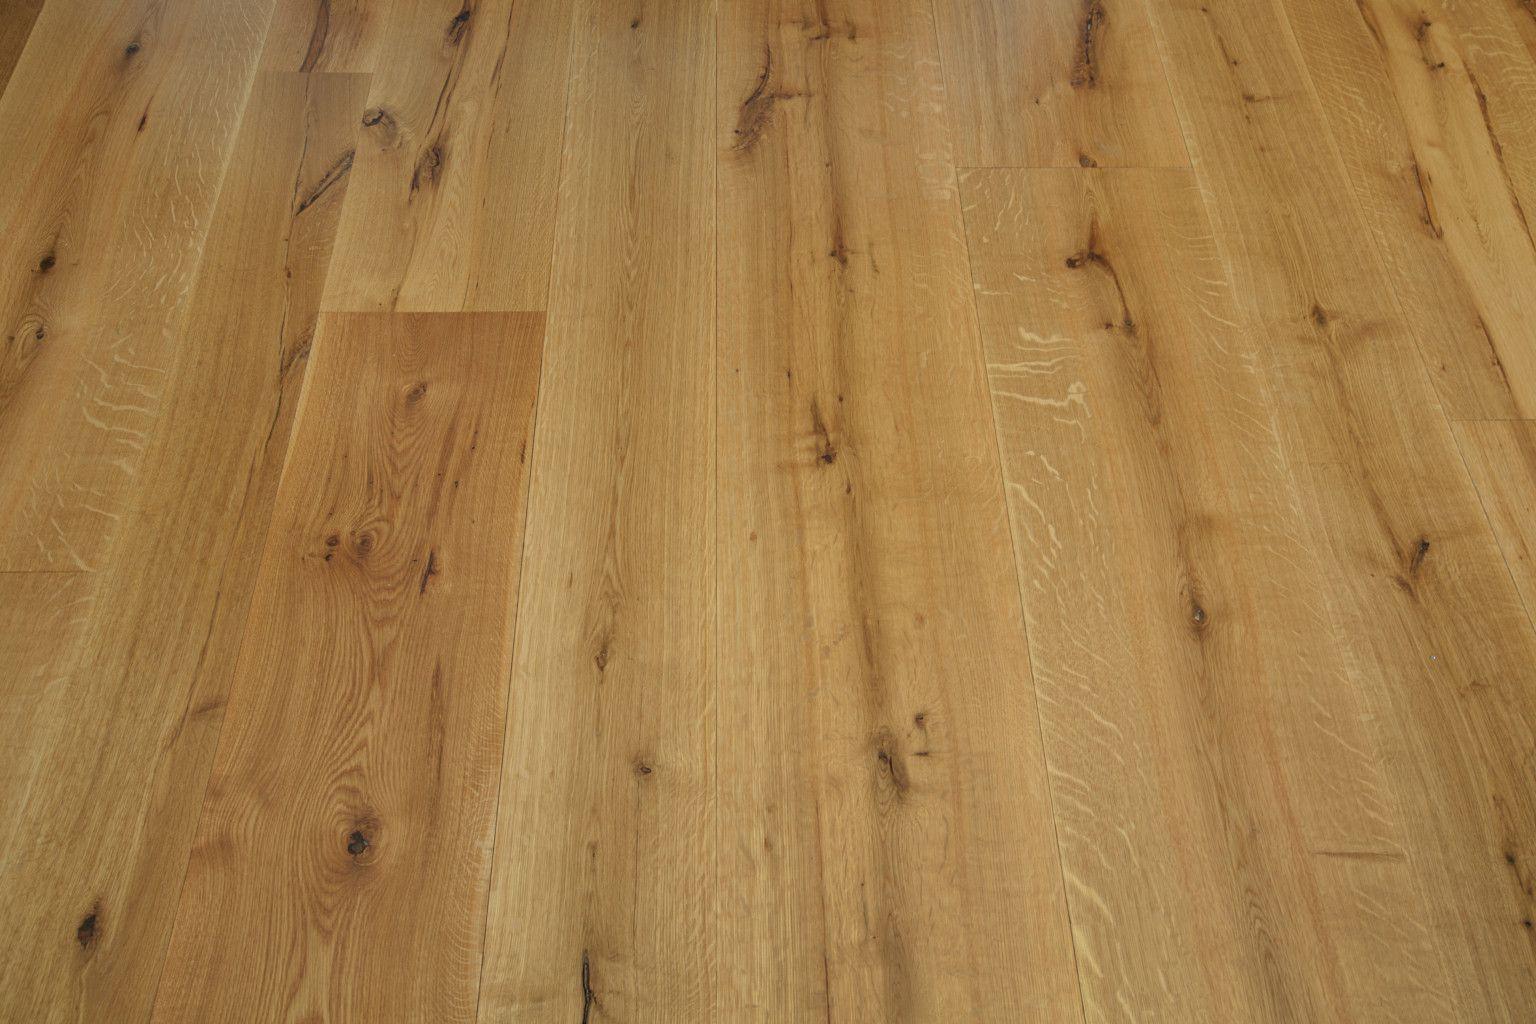 Prefinished vs. Unfinished Wide Plank Floors Wide plank